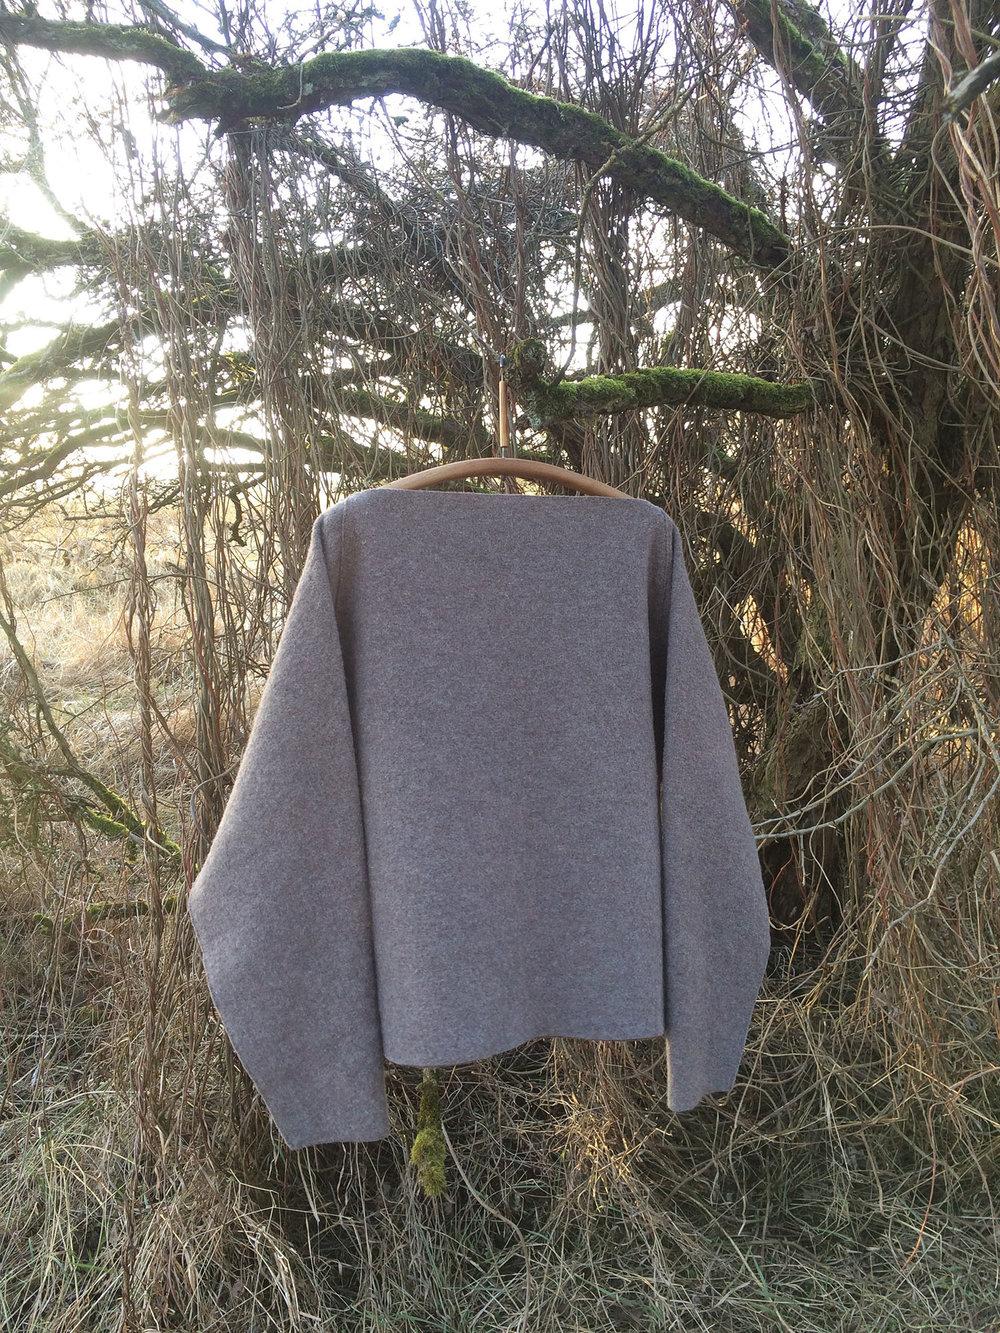 01_Anne_Schwalbe__The_Sweater_2901.jpg